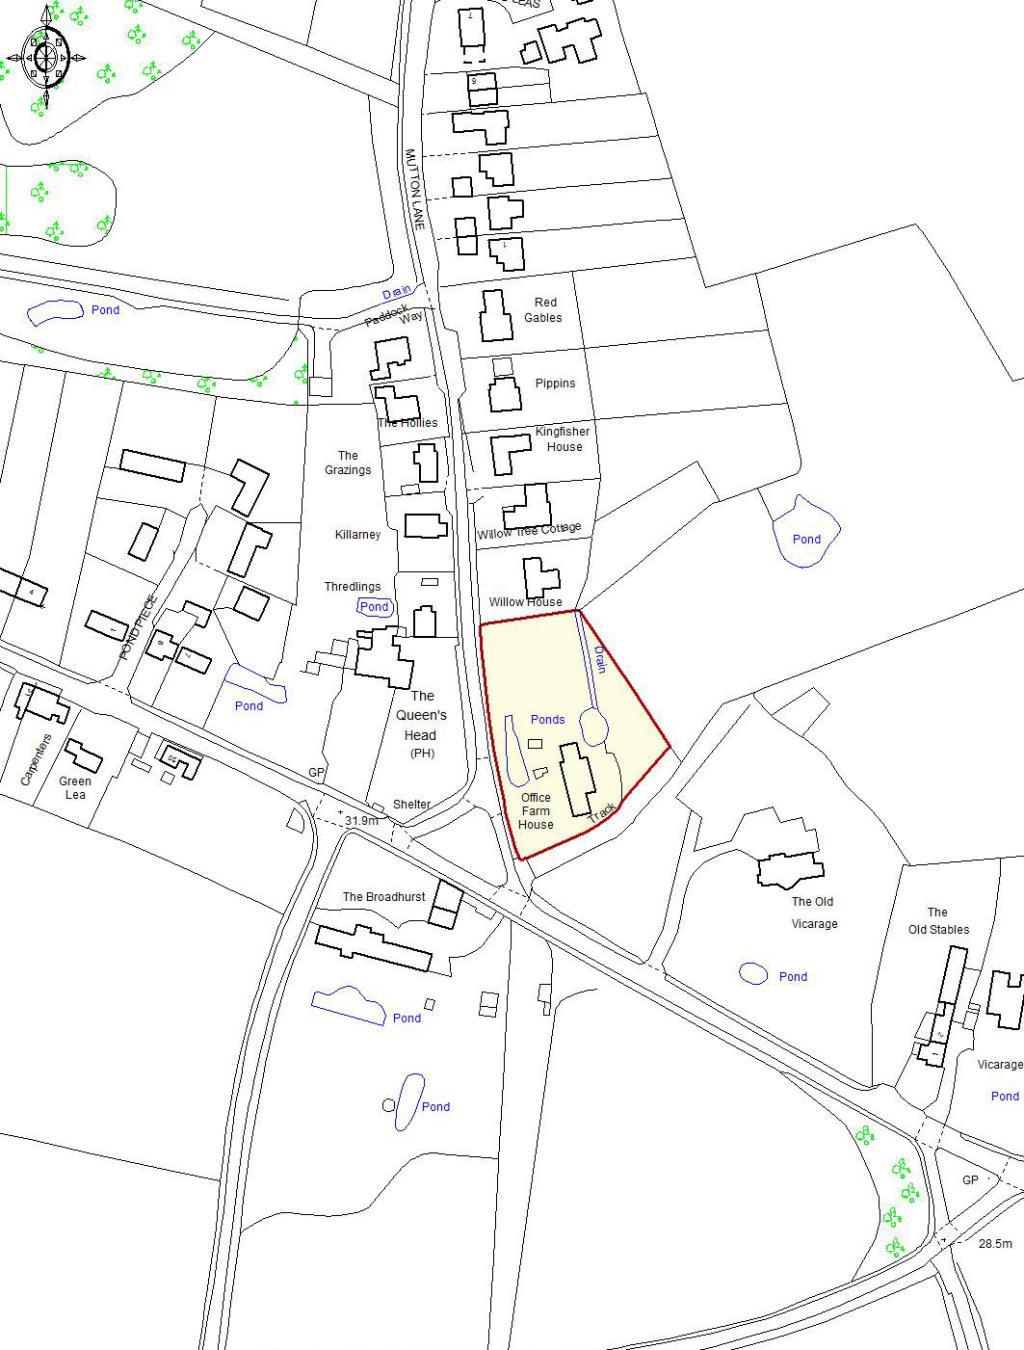 4 Bedroom Farm House For Sale In Brandeston Nr Framlingham Suffolk IP13